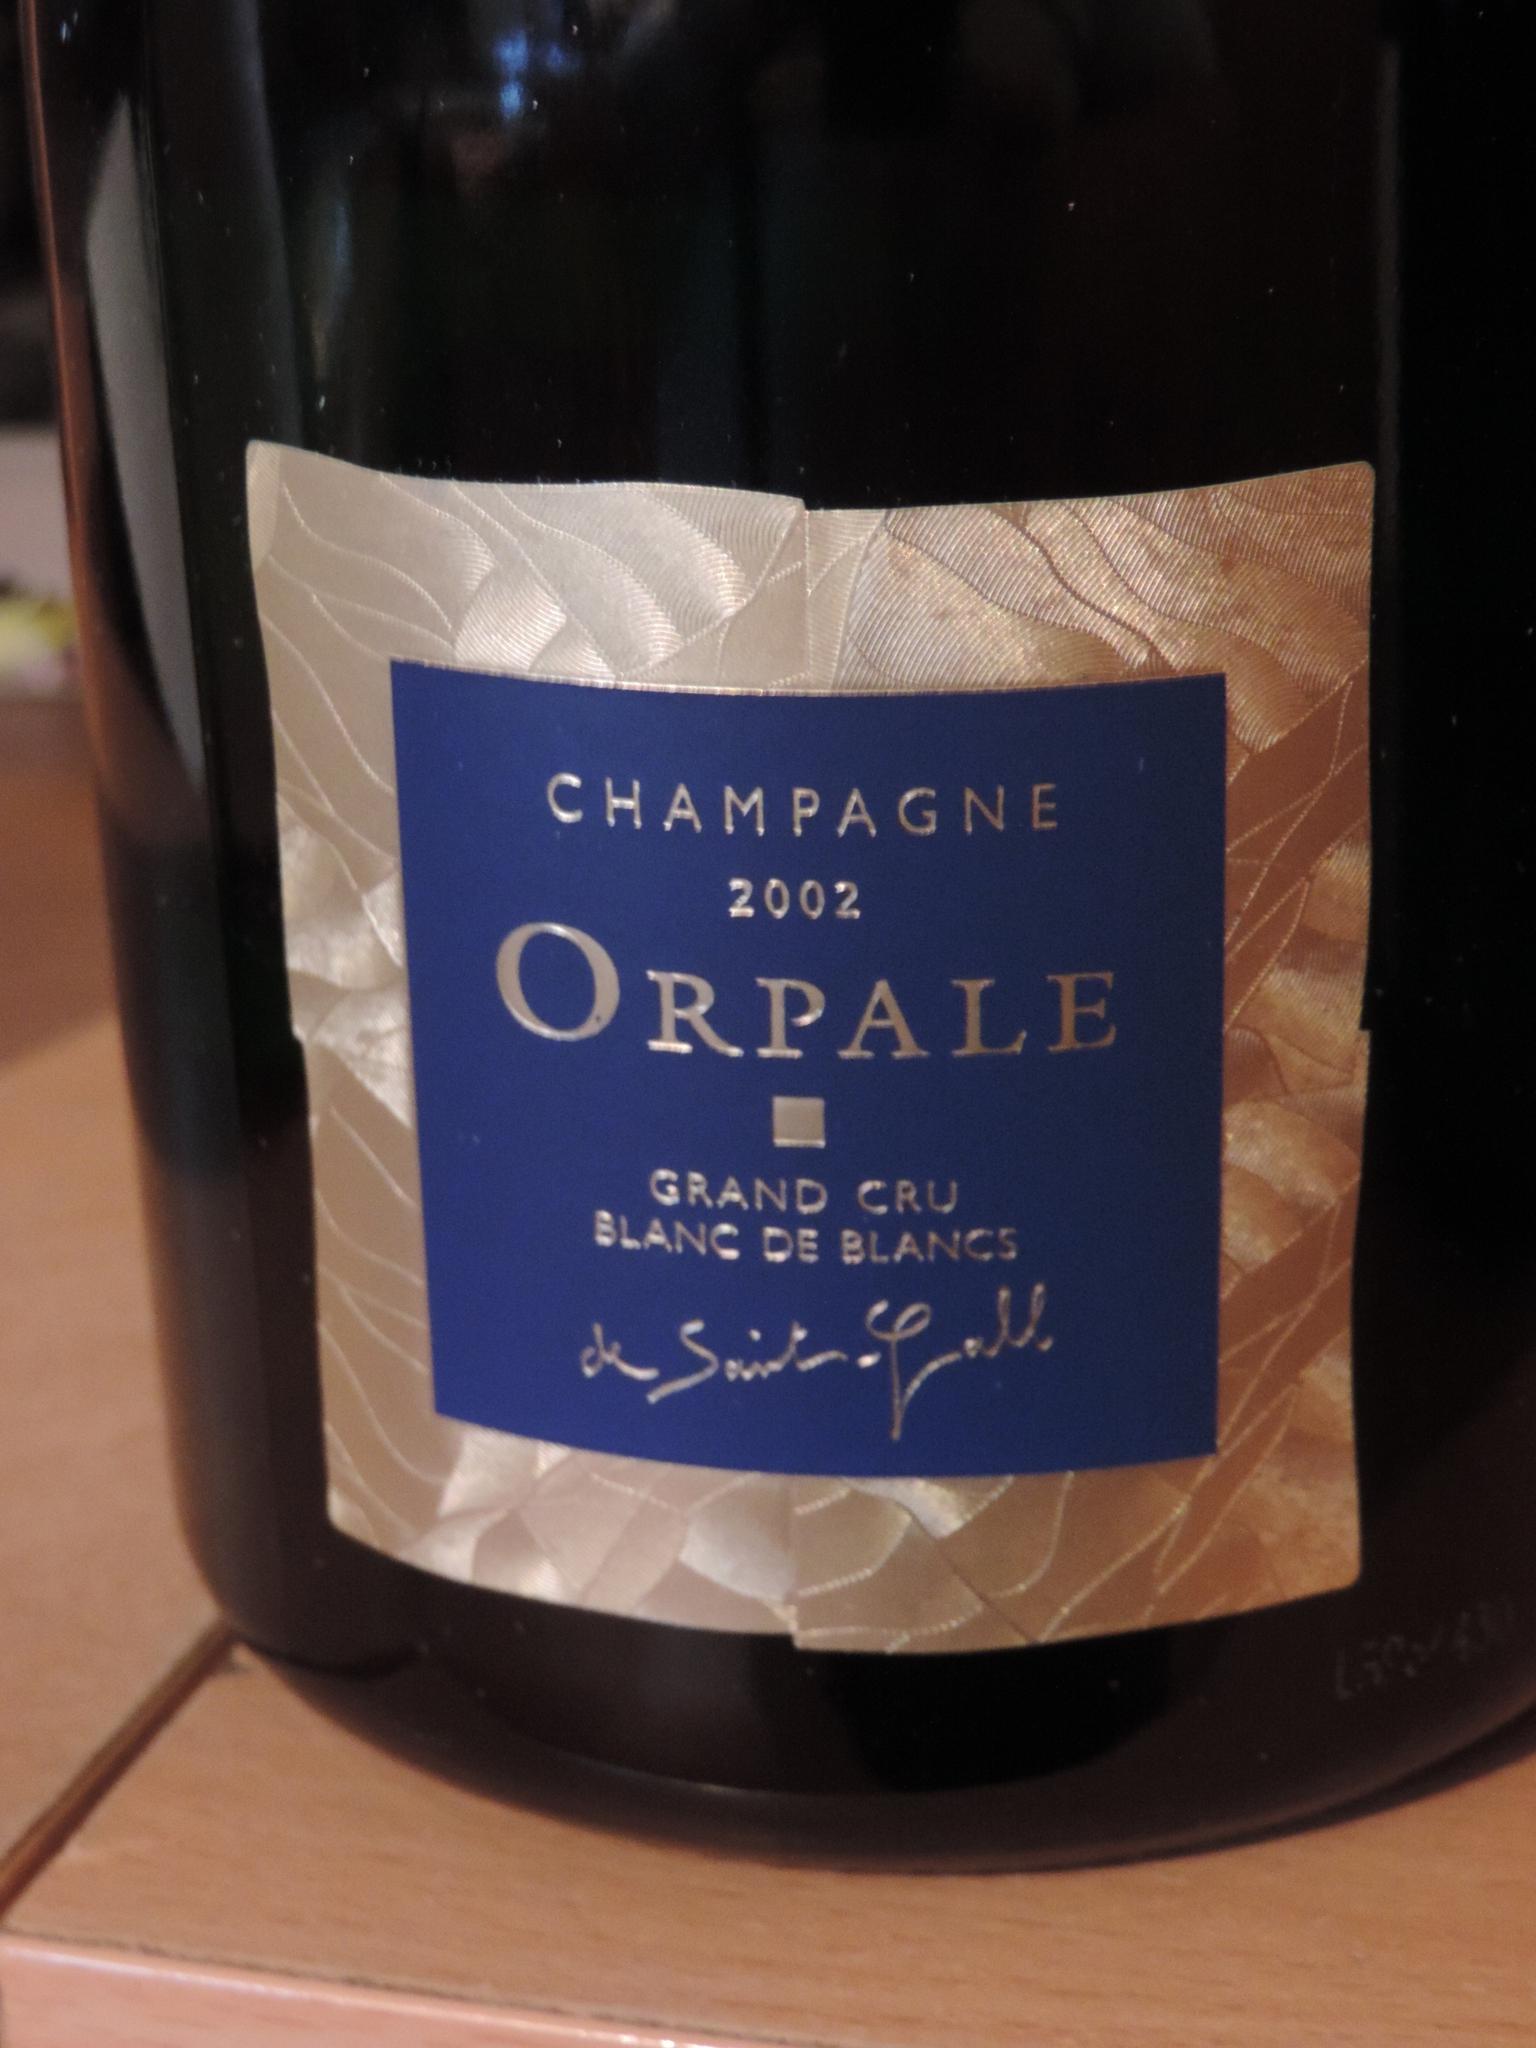 "champagne saint-gall 2002 grand cru blanc de blancs ""cuvée orpale"""